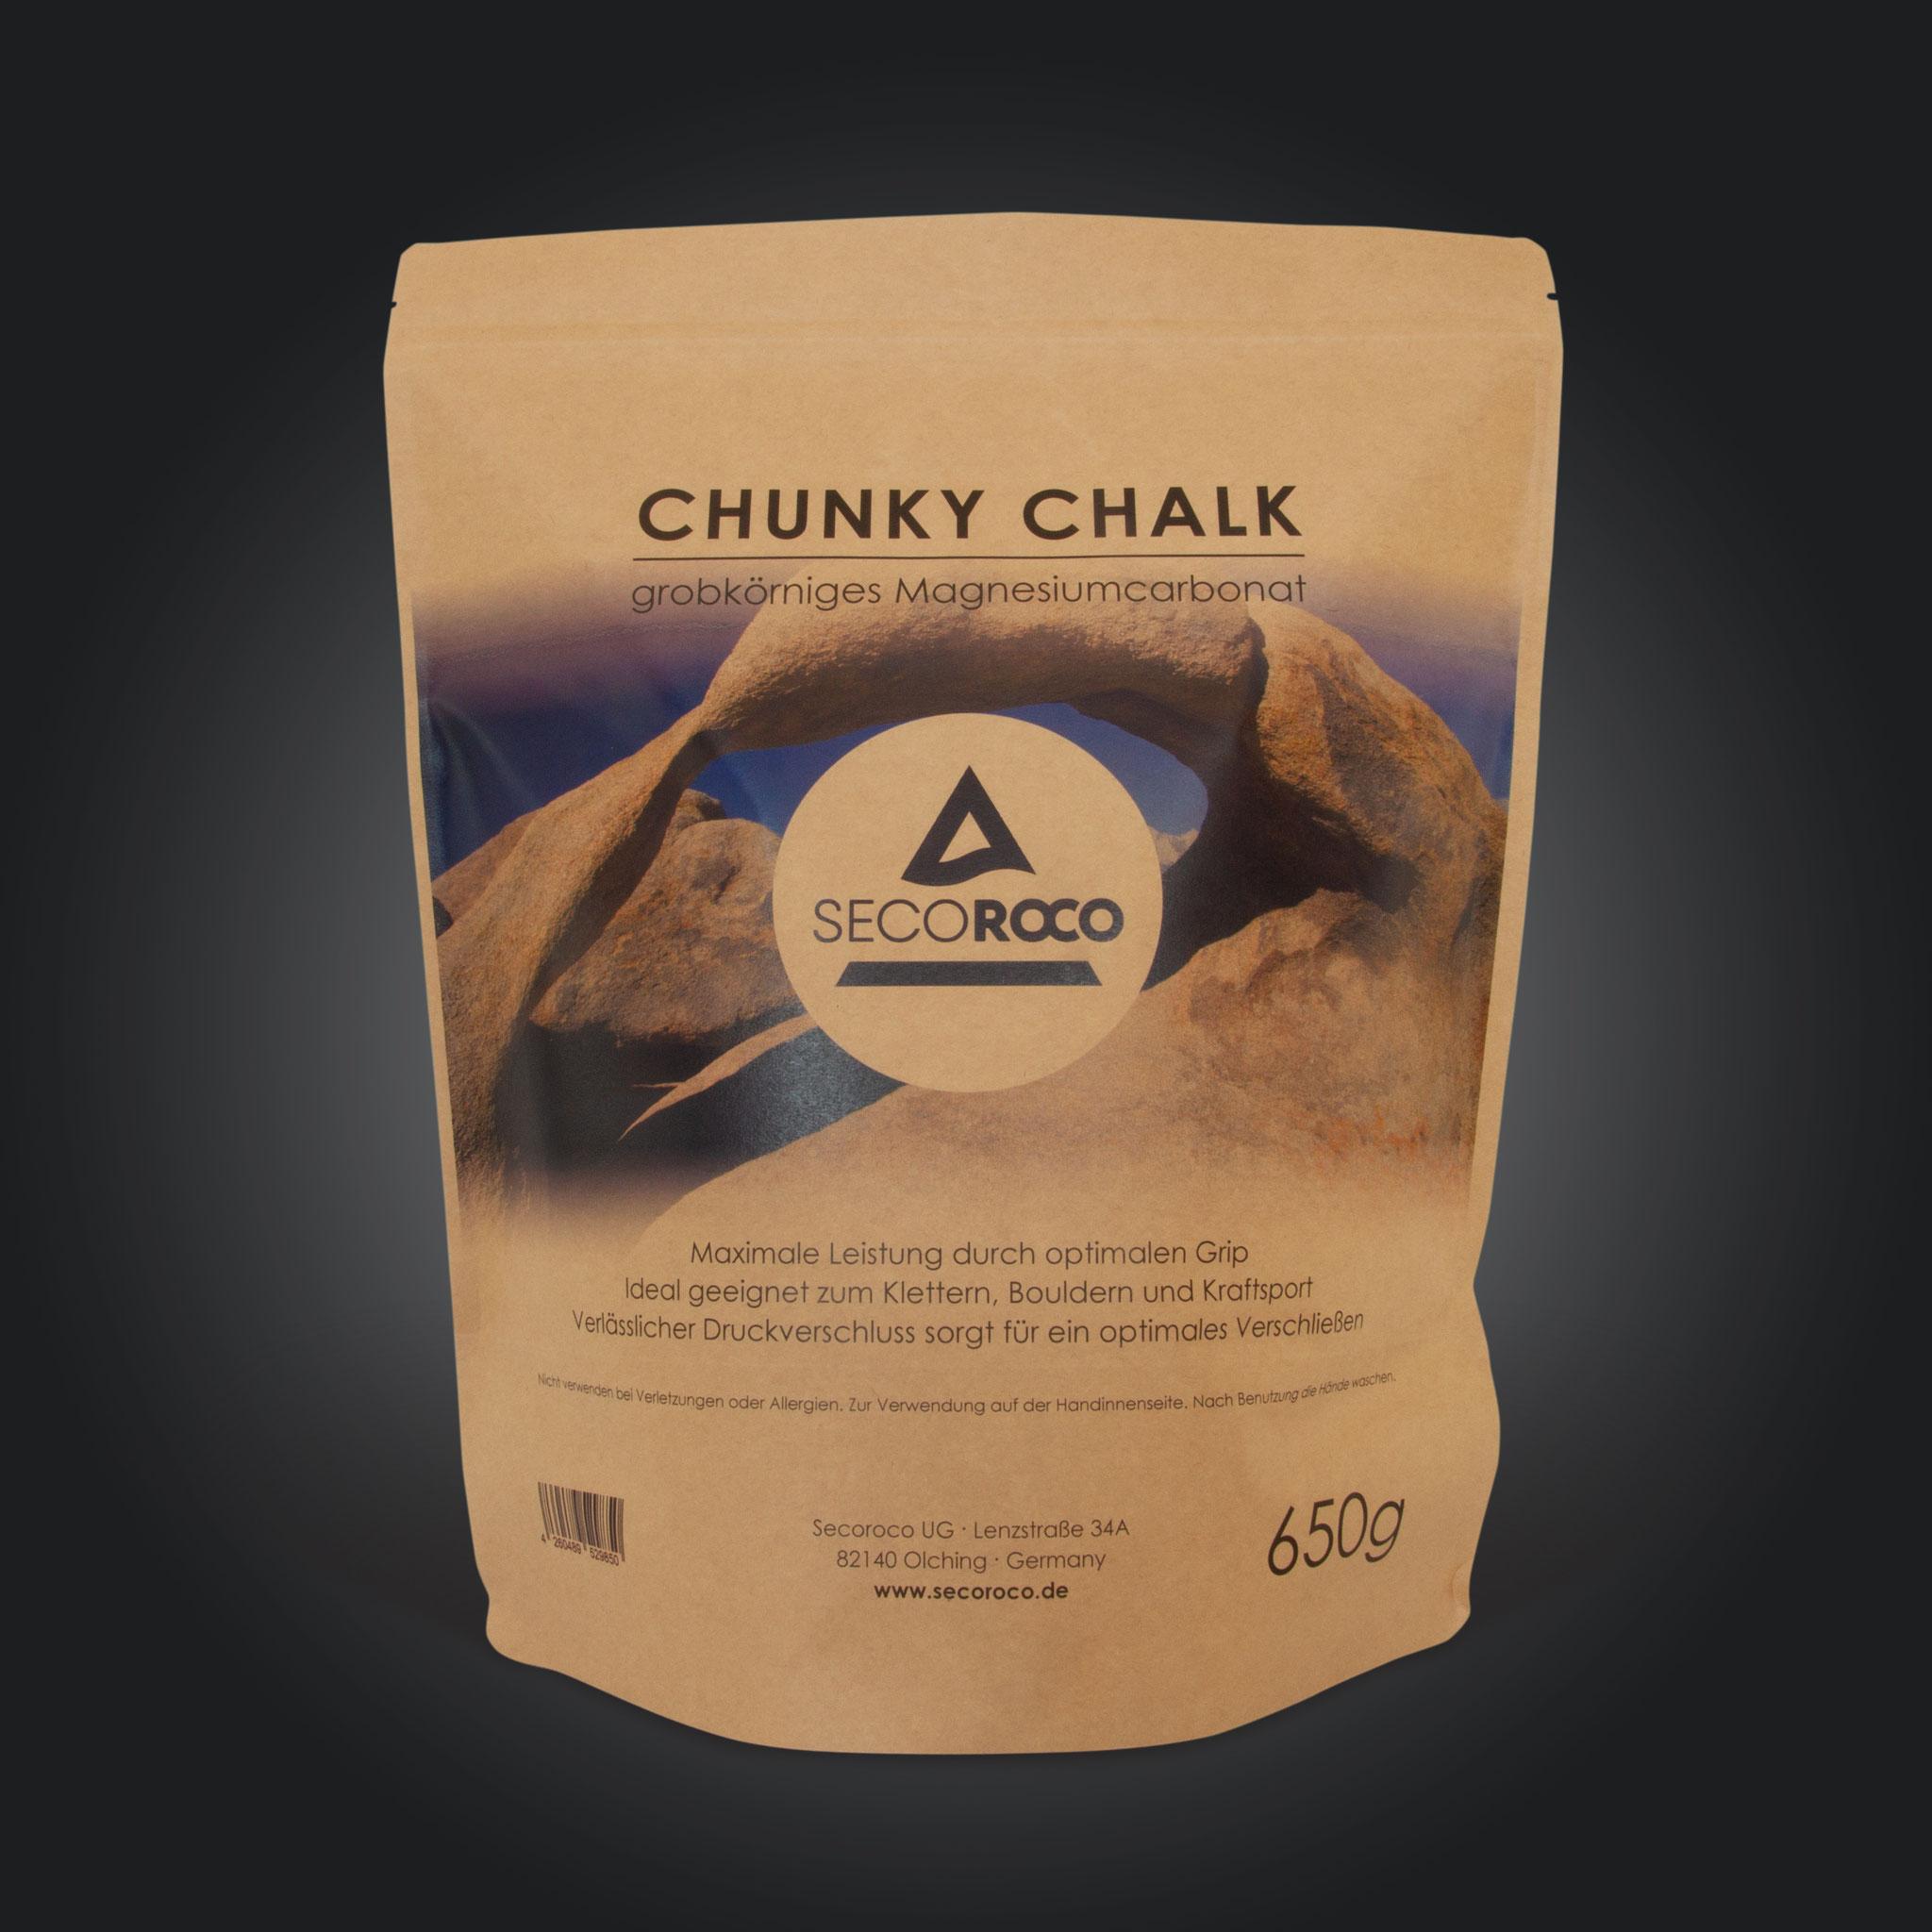 Chunky Chalk - 650g